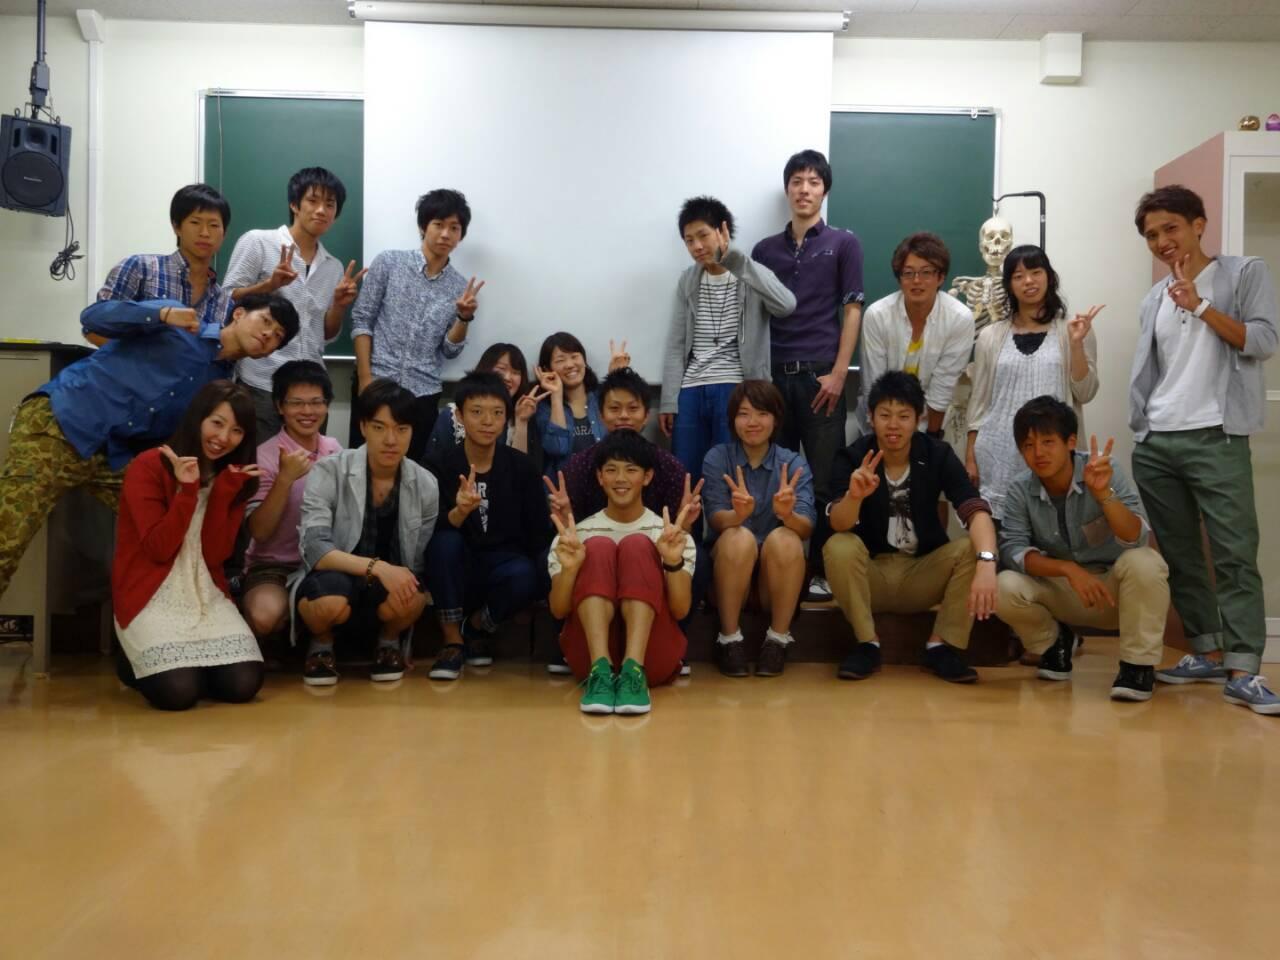 説明会後の集合写真(^^)